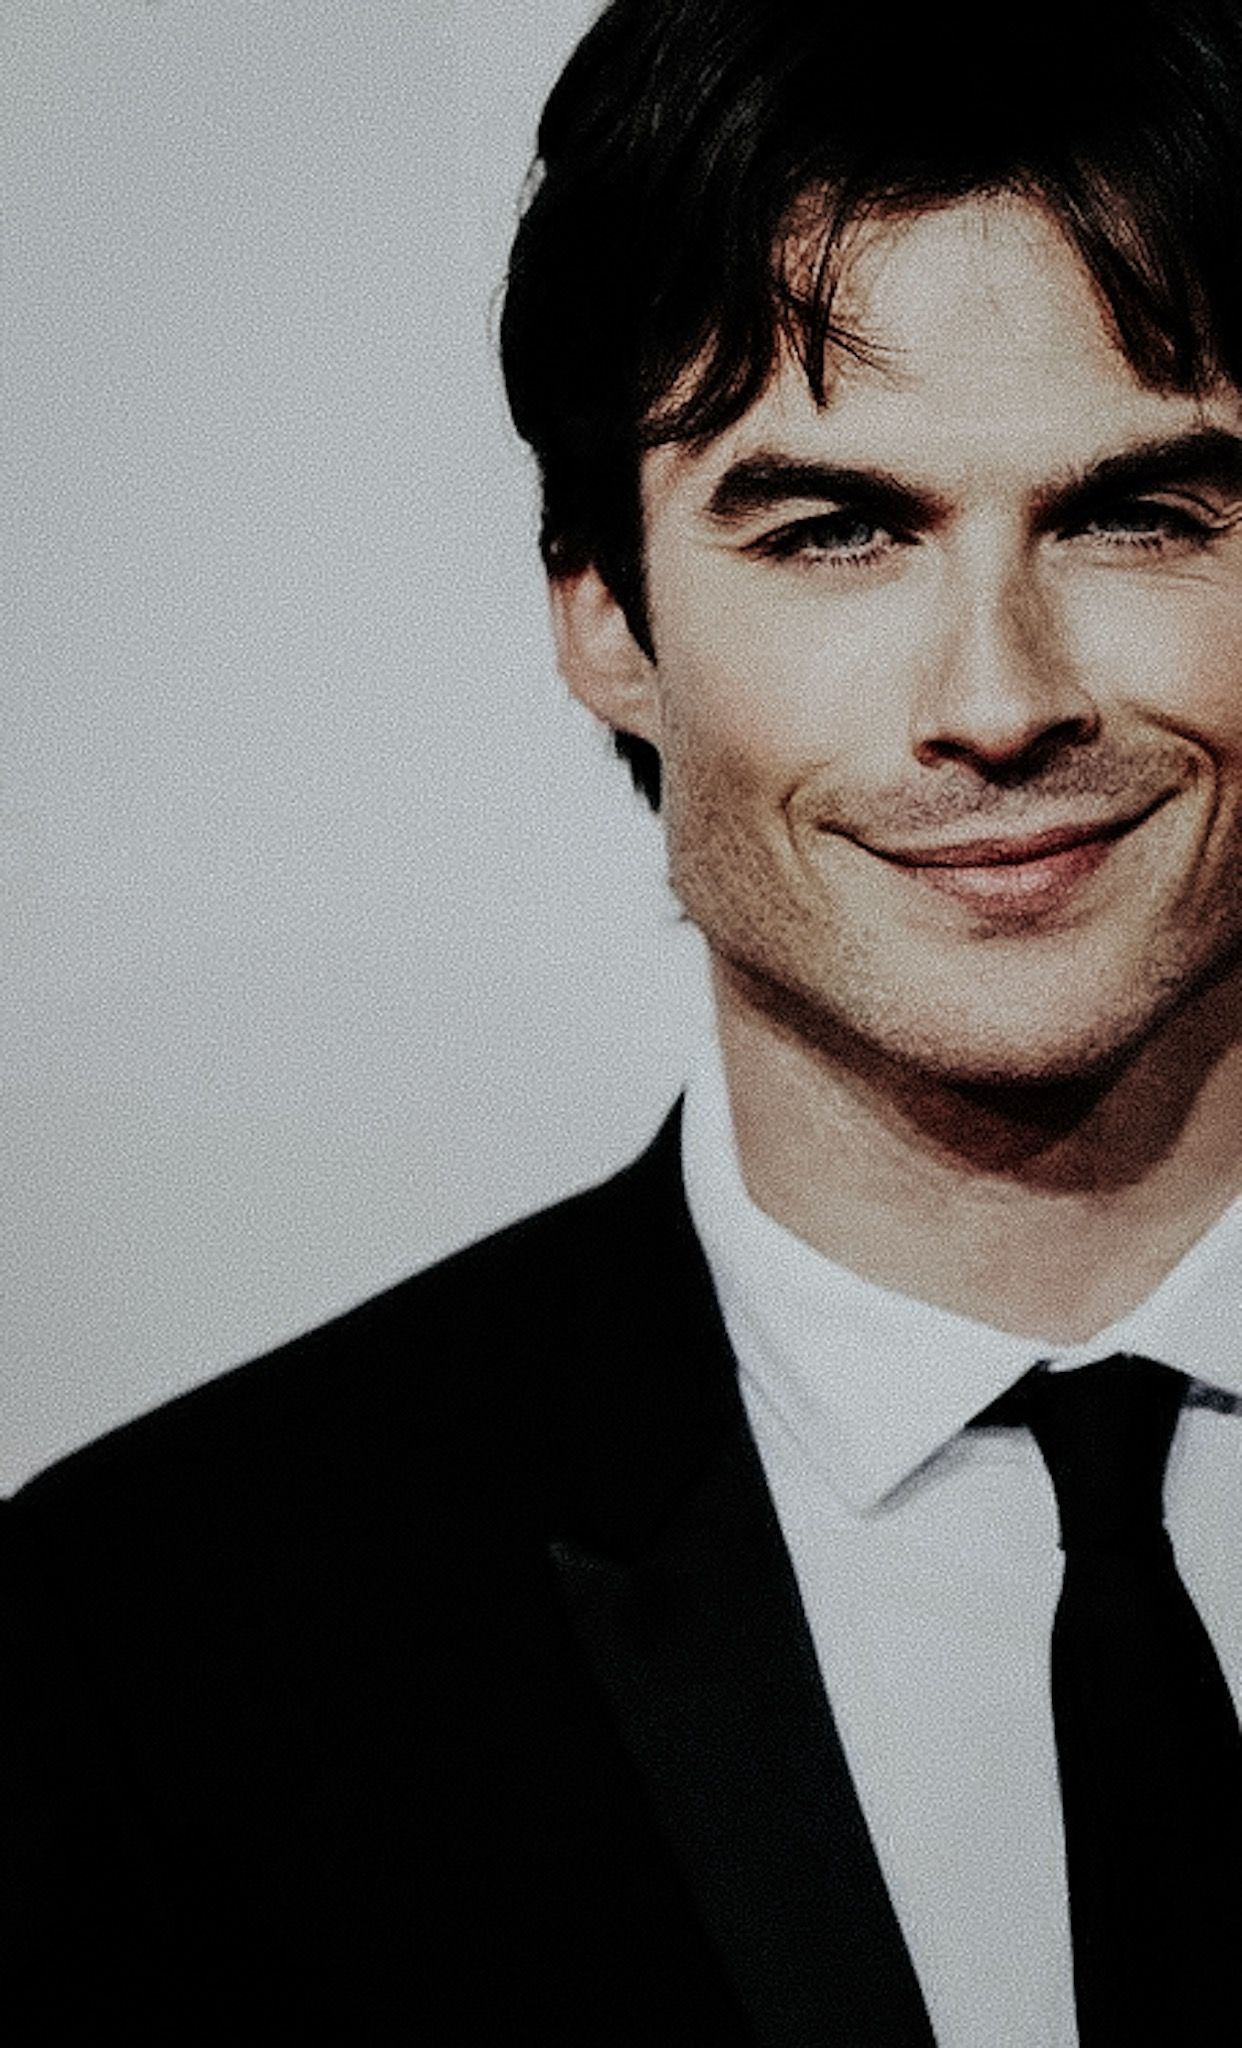 His Smile Vampire Diaries Damon Ian Somerhalder Vampire